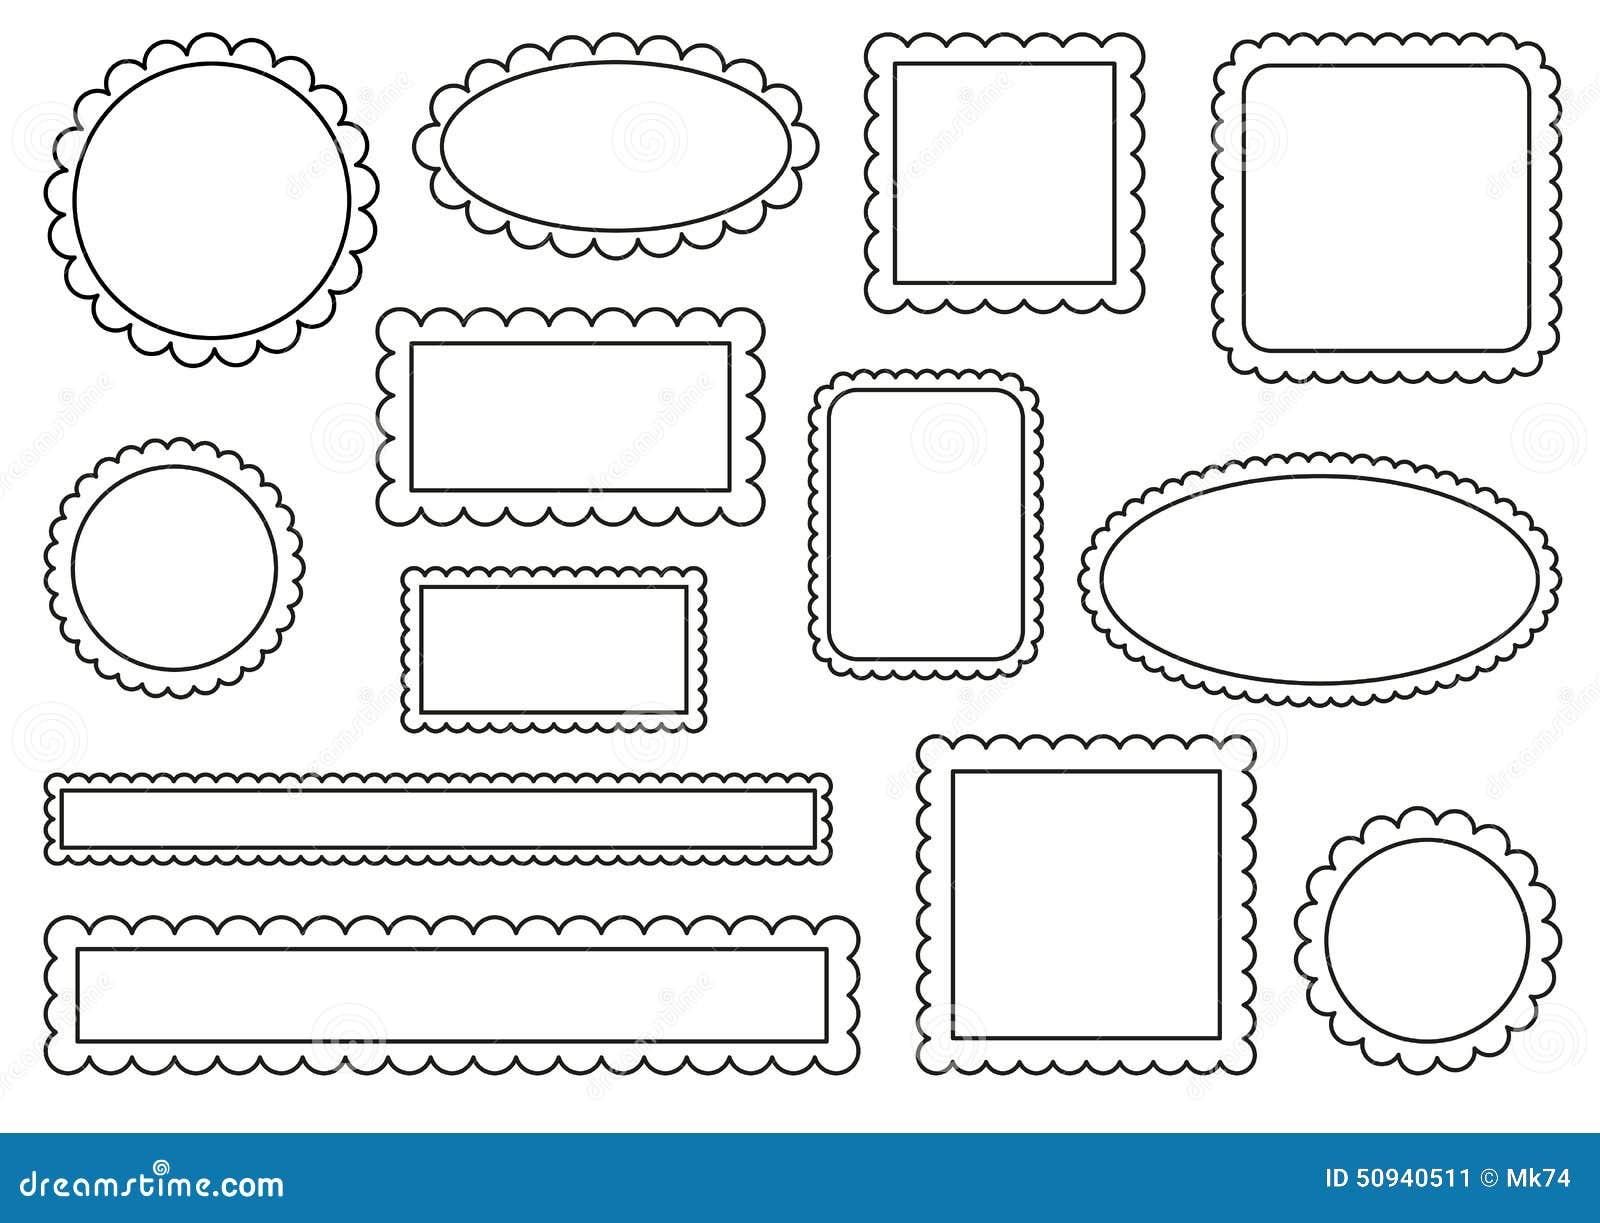 Scalloped frames stock vector. Illustration of label - 50940511